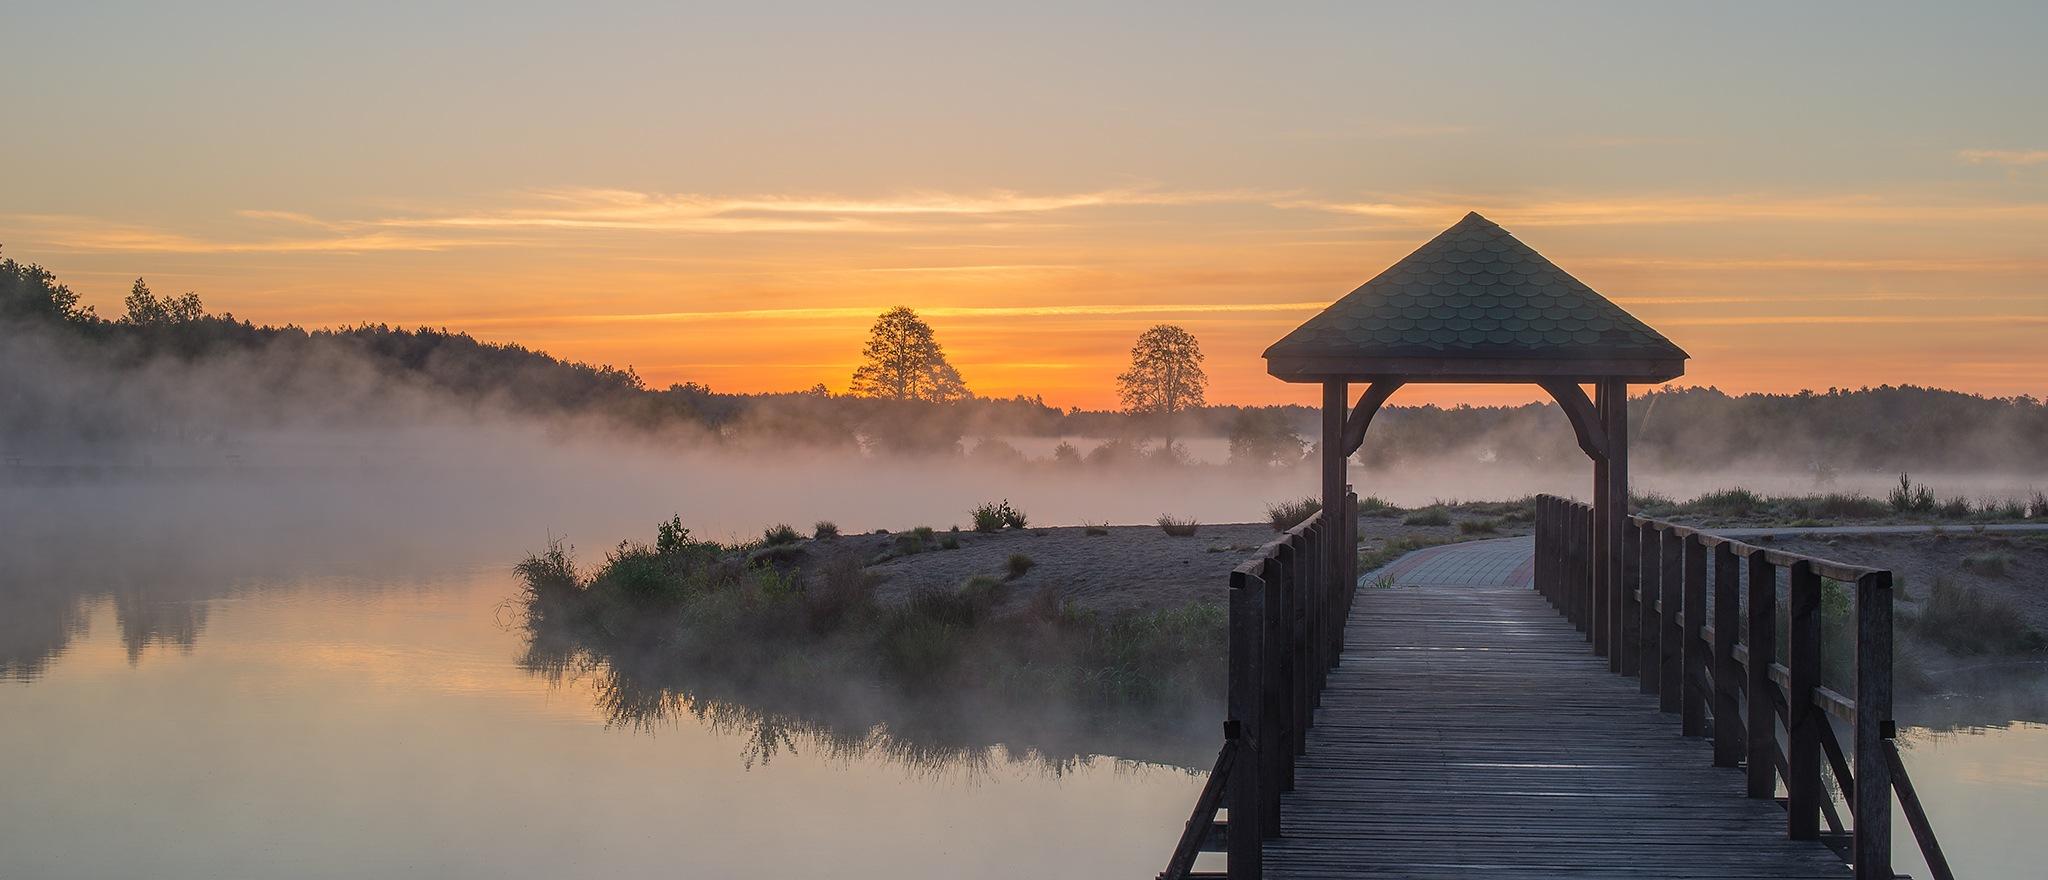 Misty Lake - part4 by Damian Pawlos